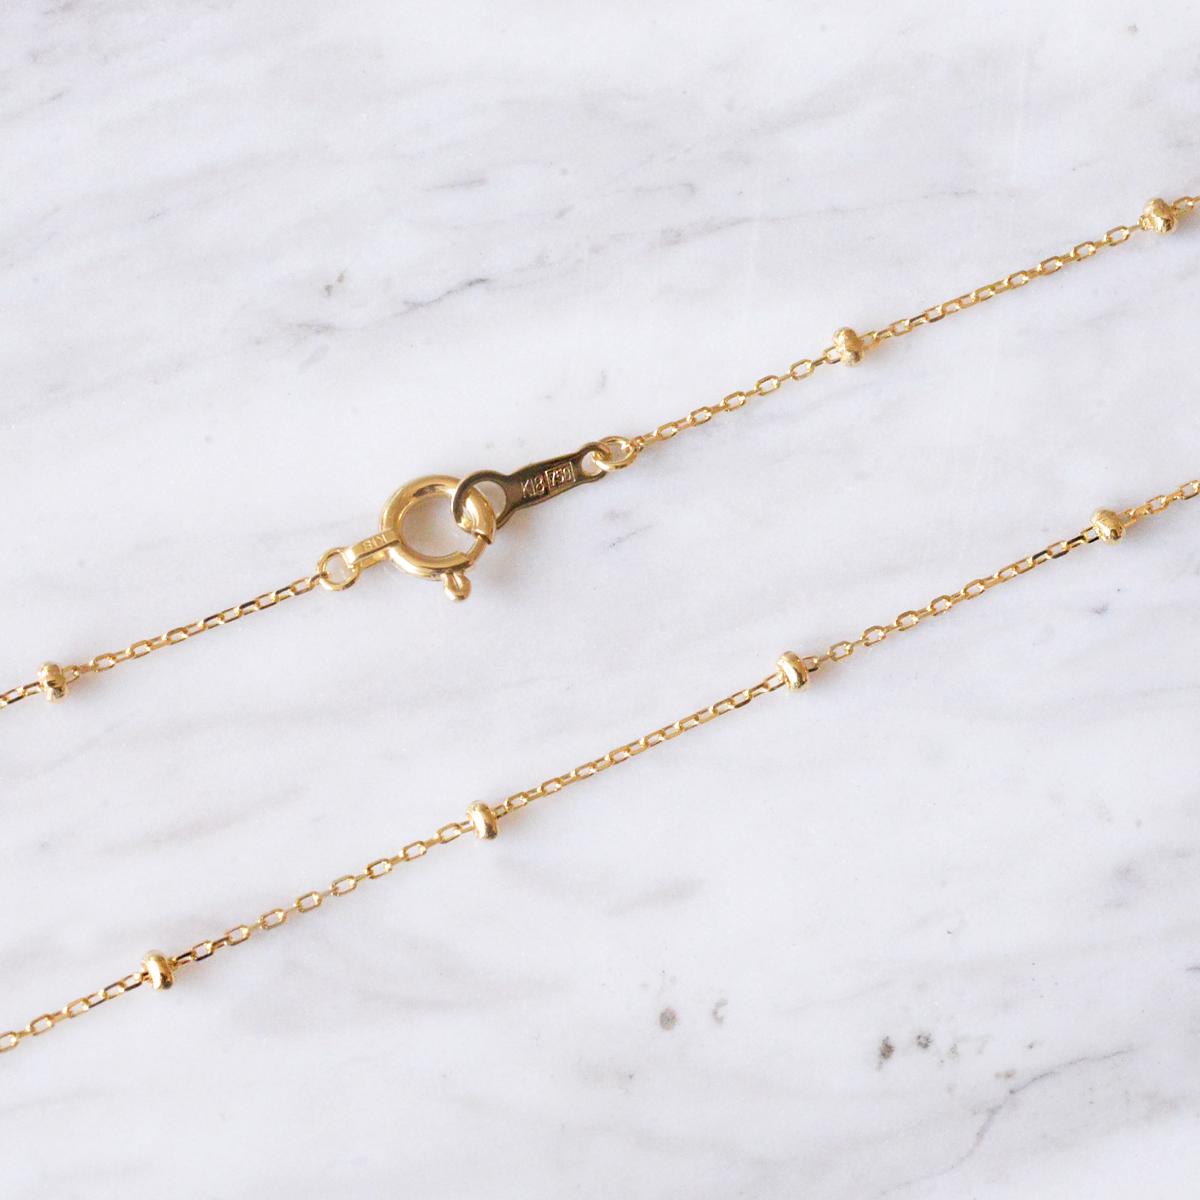 k18ネックレス K18 イエローゴールド スタッド アズキチェーン ビーズ幅1.7mm チェーン 37cm/ プレゼント ギフト gold necklace ach1663c37